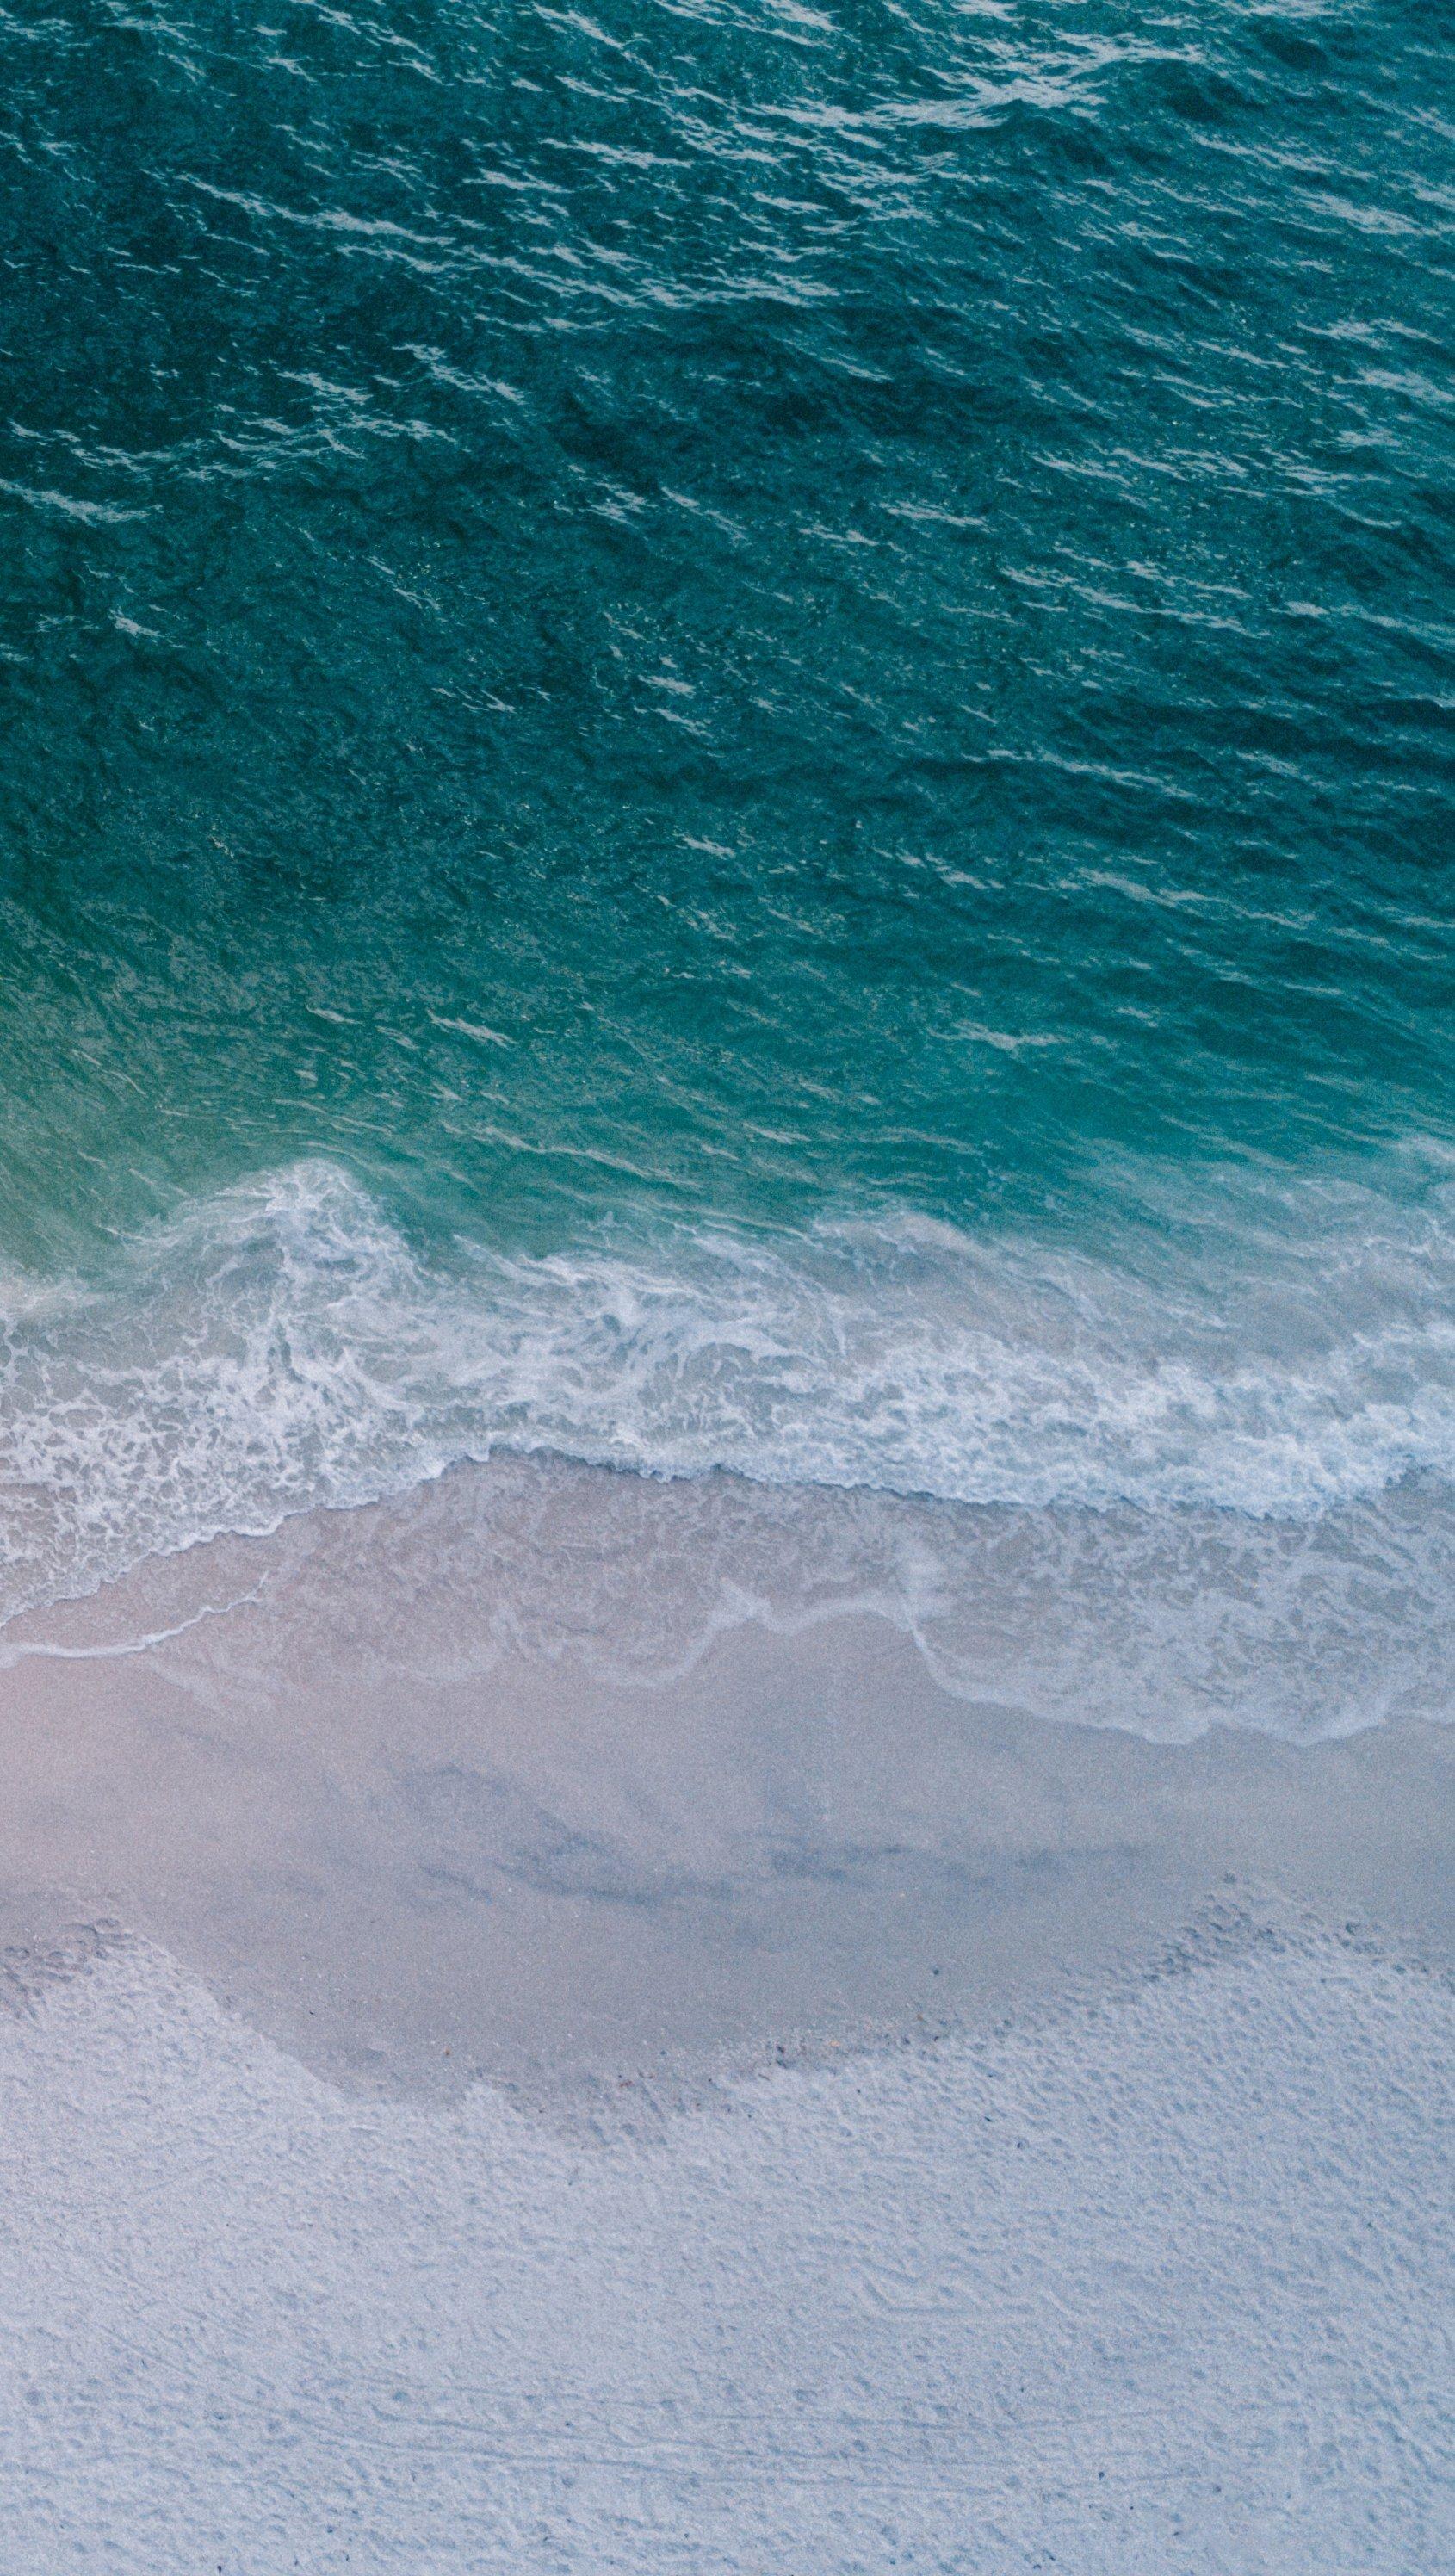 Wallpaper Island Coast Aerial View Vertical